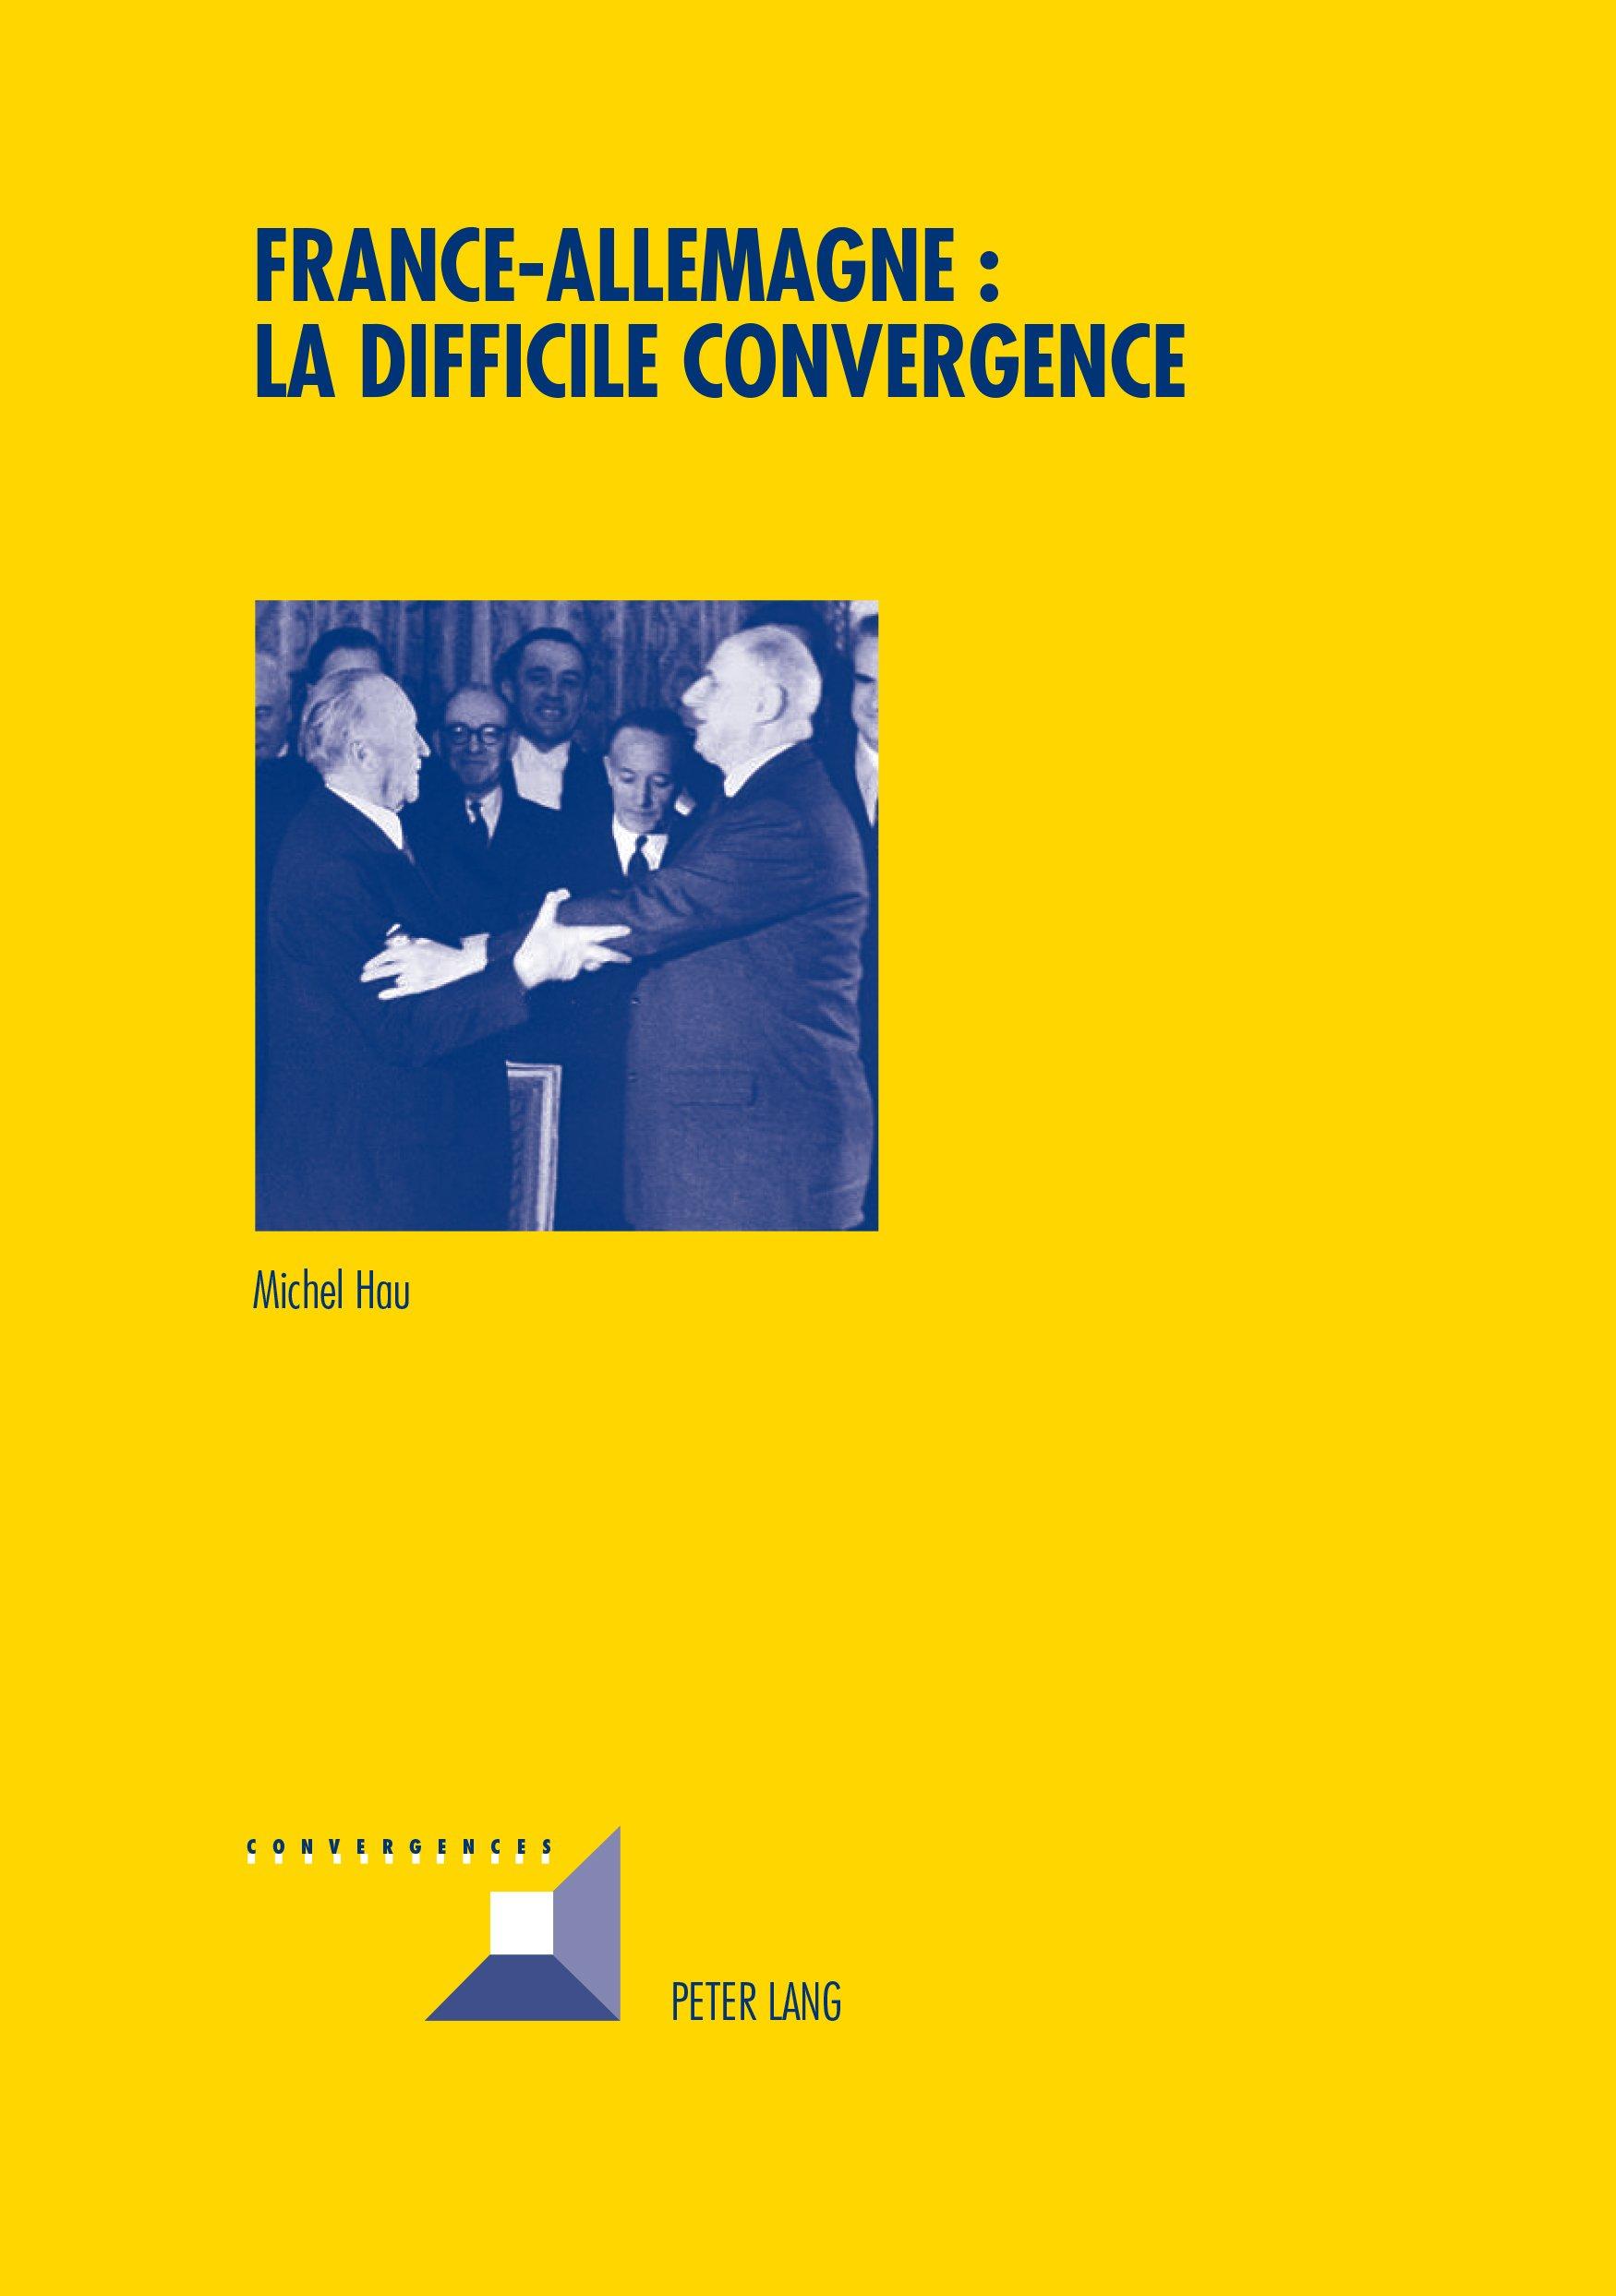 France-Allemagne : la difficile convergence (Convergences t. 84) (French Edition)